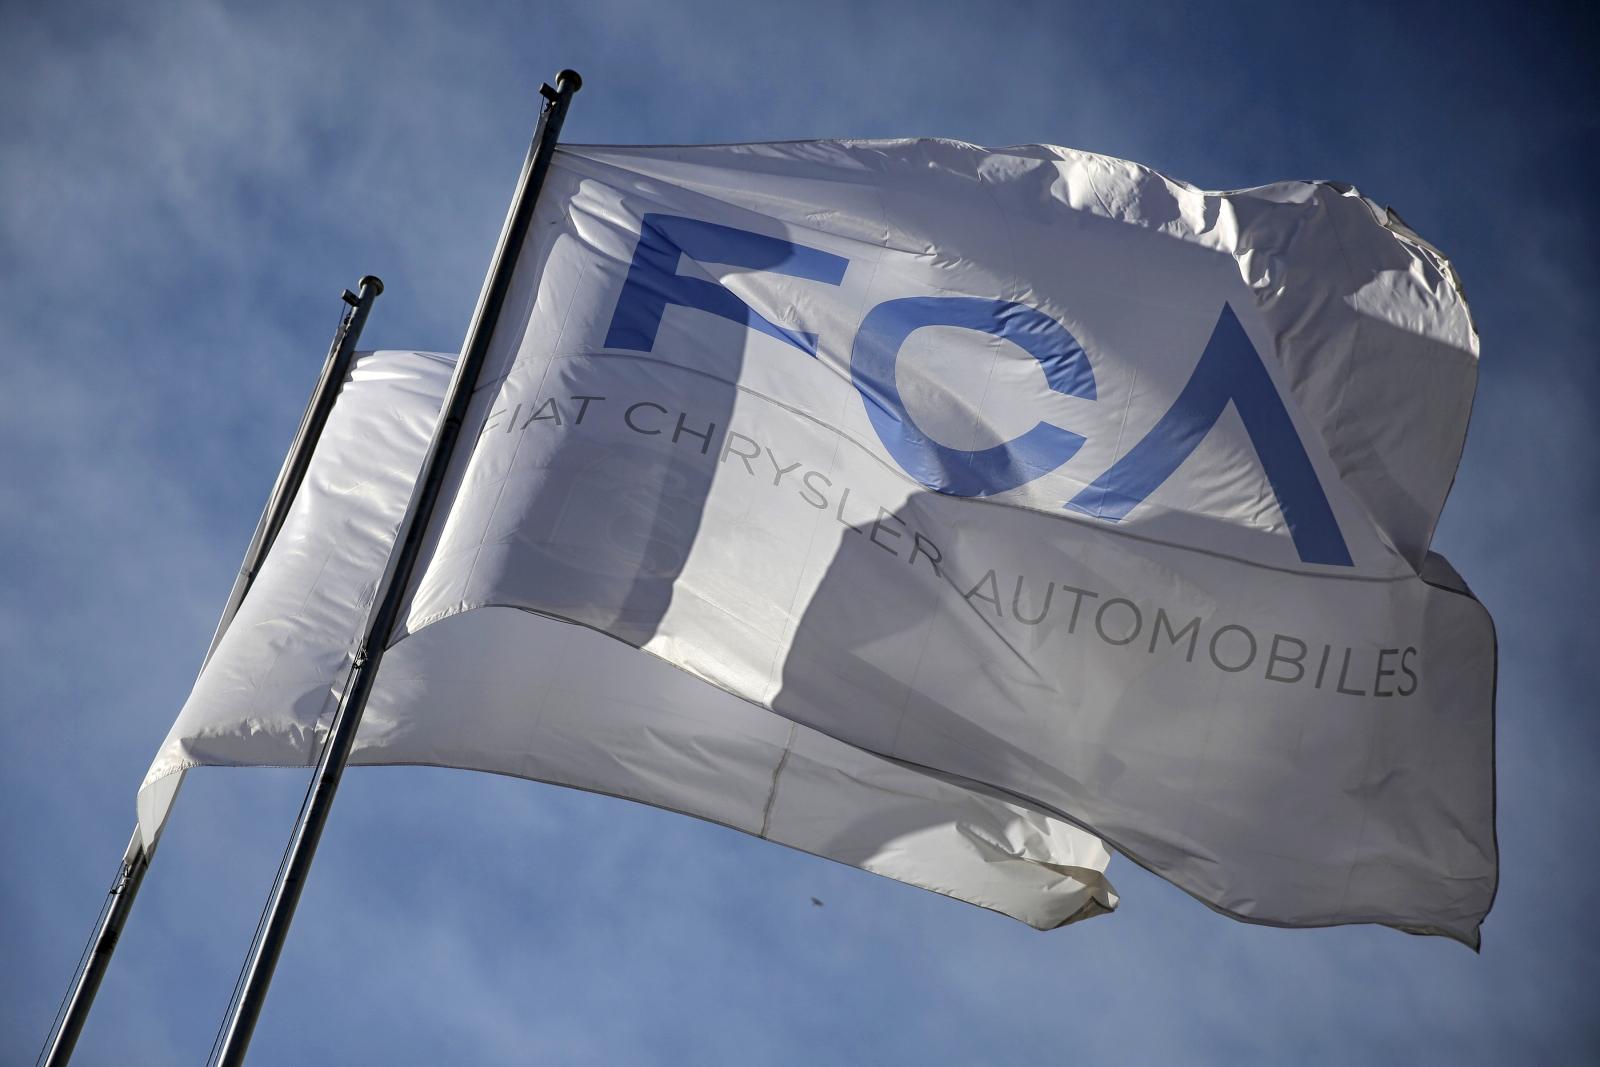 Fiat Chrysler recalls 1.25 million trucks